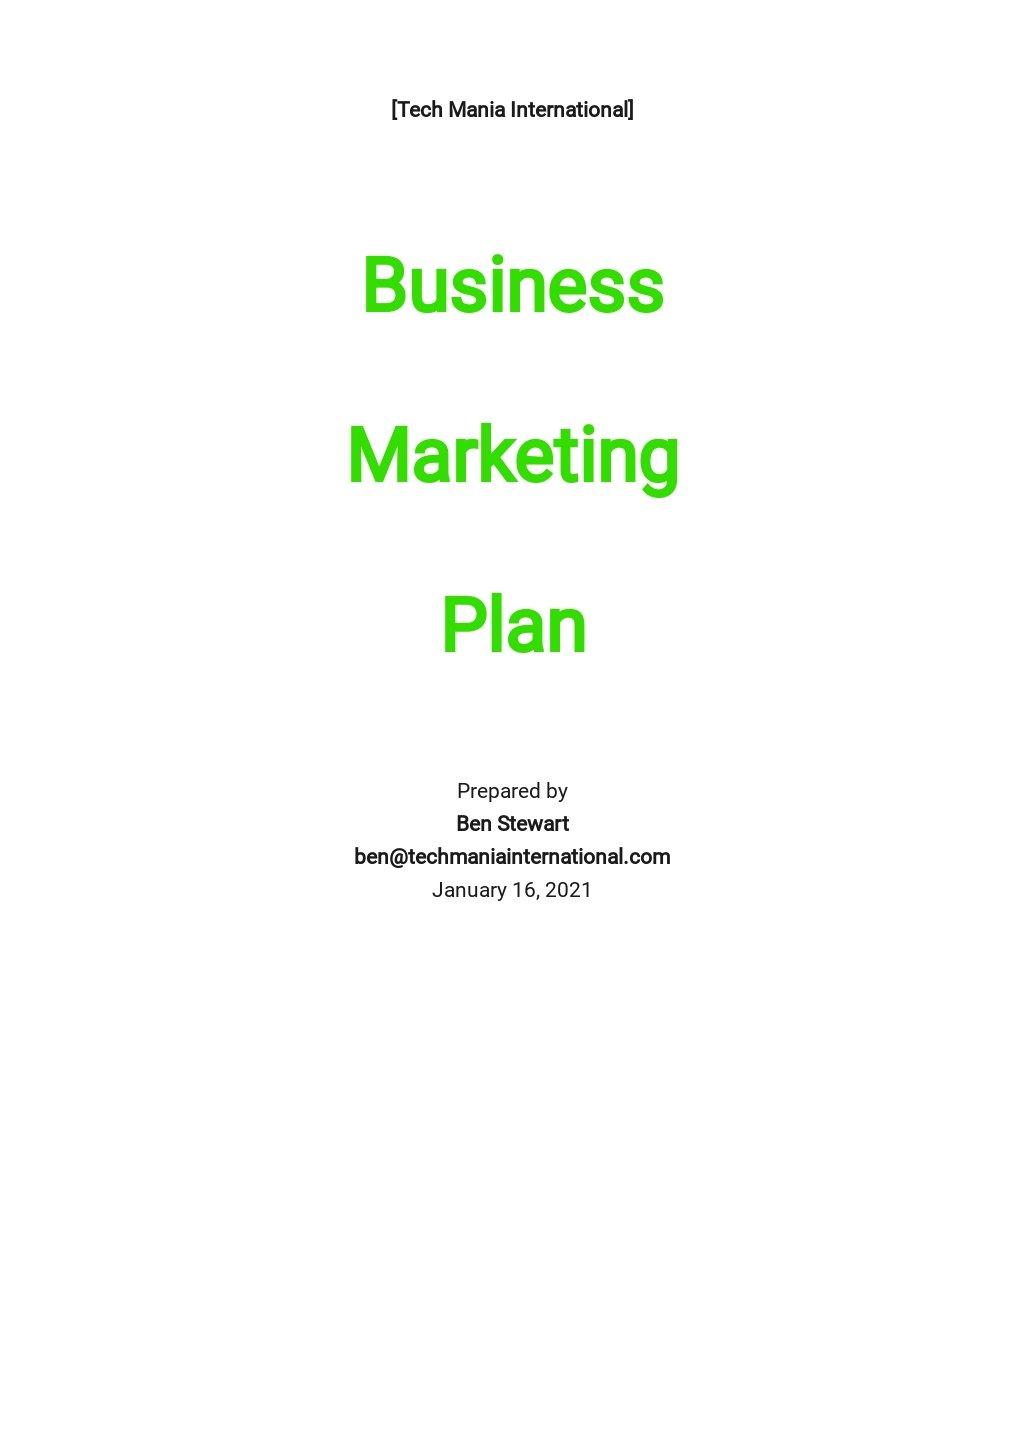 IT Business Marketing Plan Template.jpe